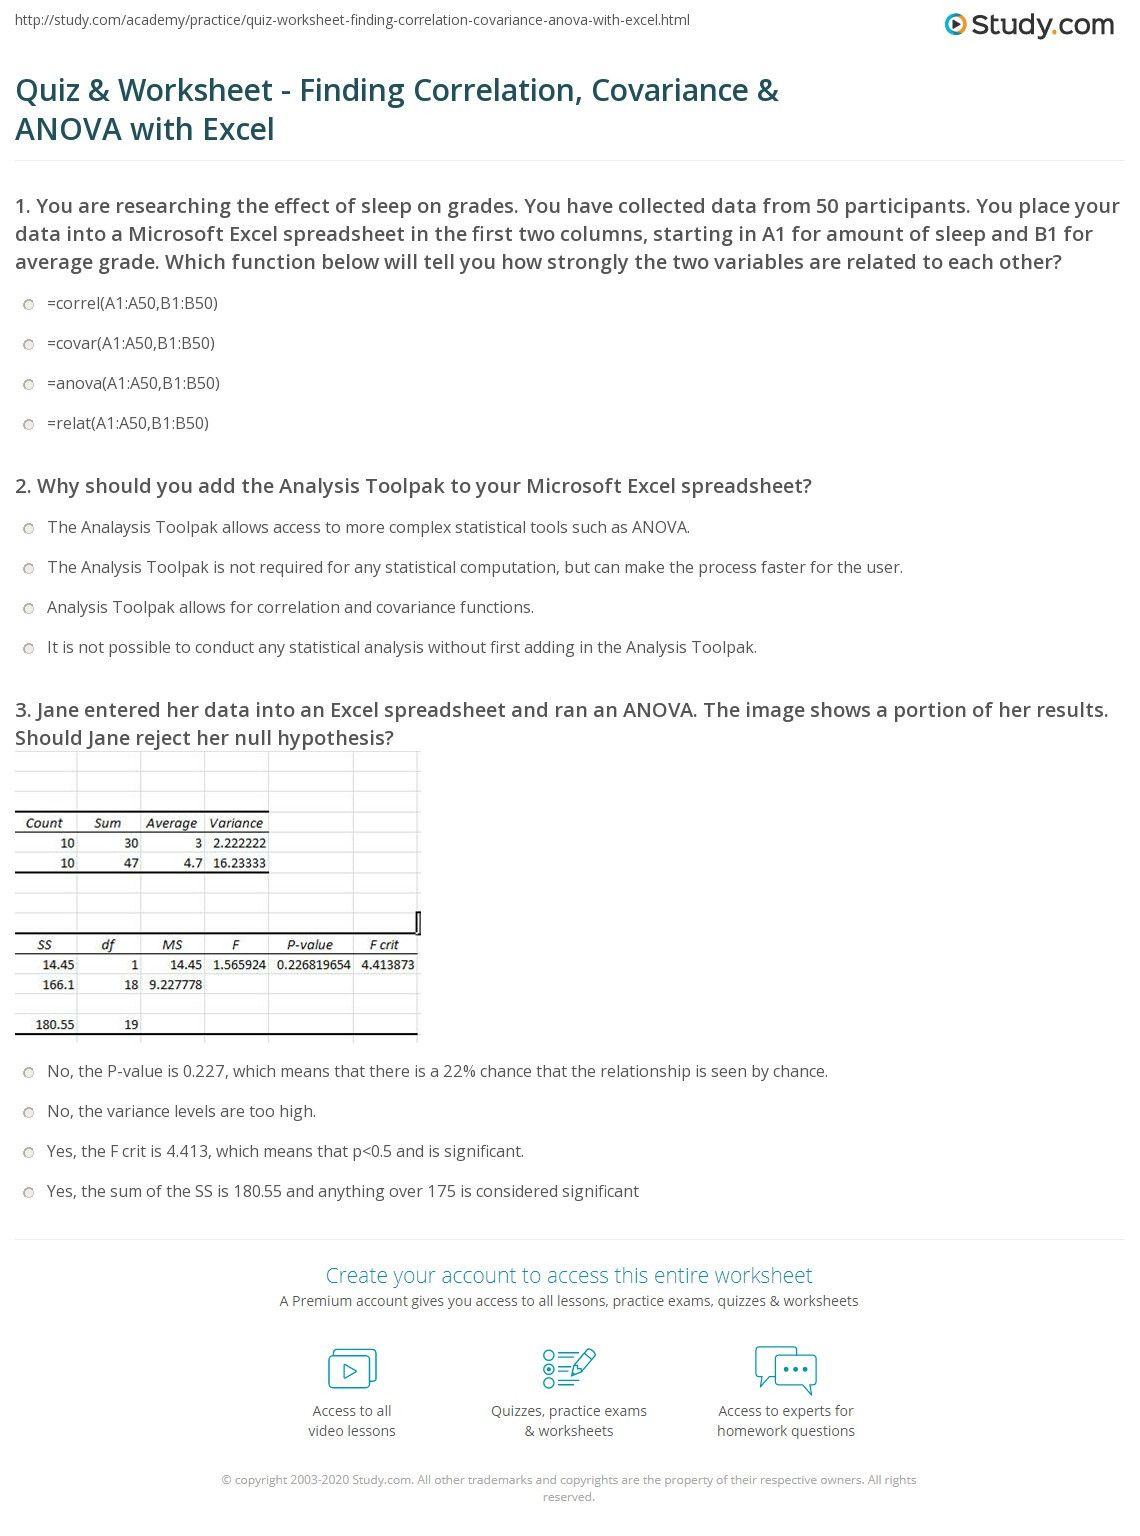 Correlation Vs Causation Worksheet In